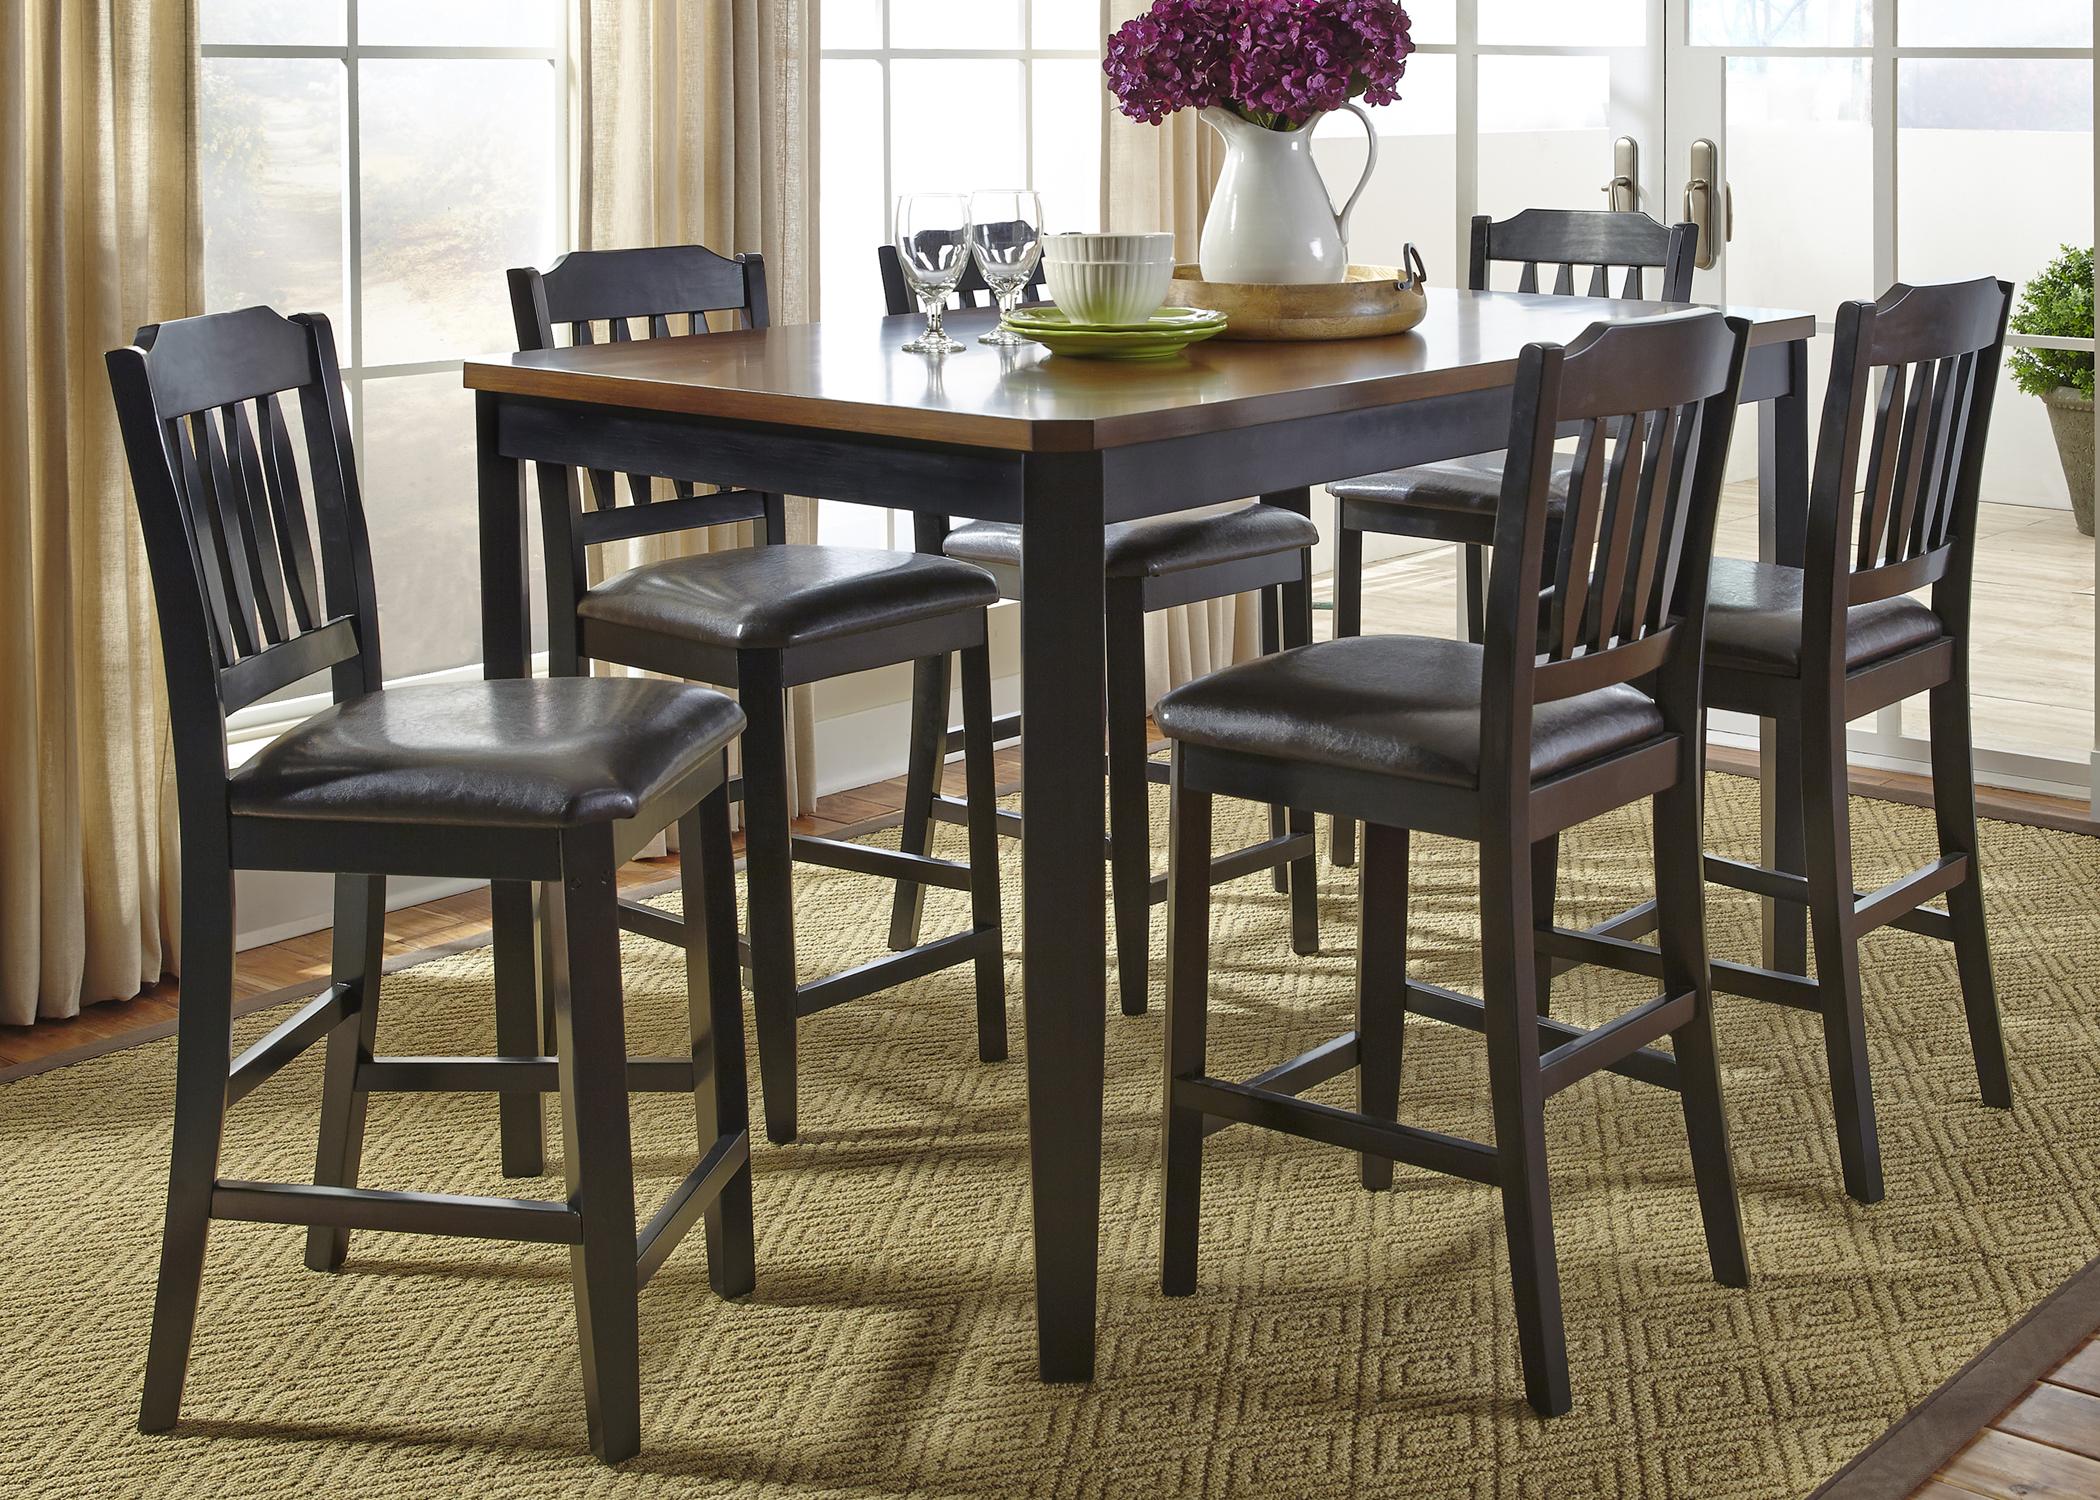 Liberty Furniture 7 Piece Gathering Table Set